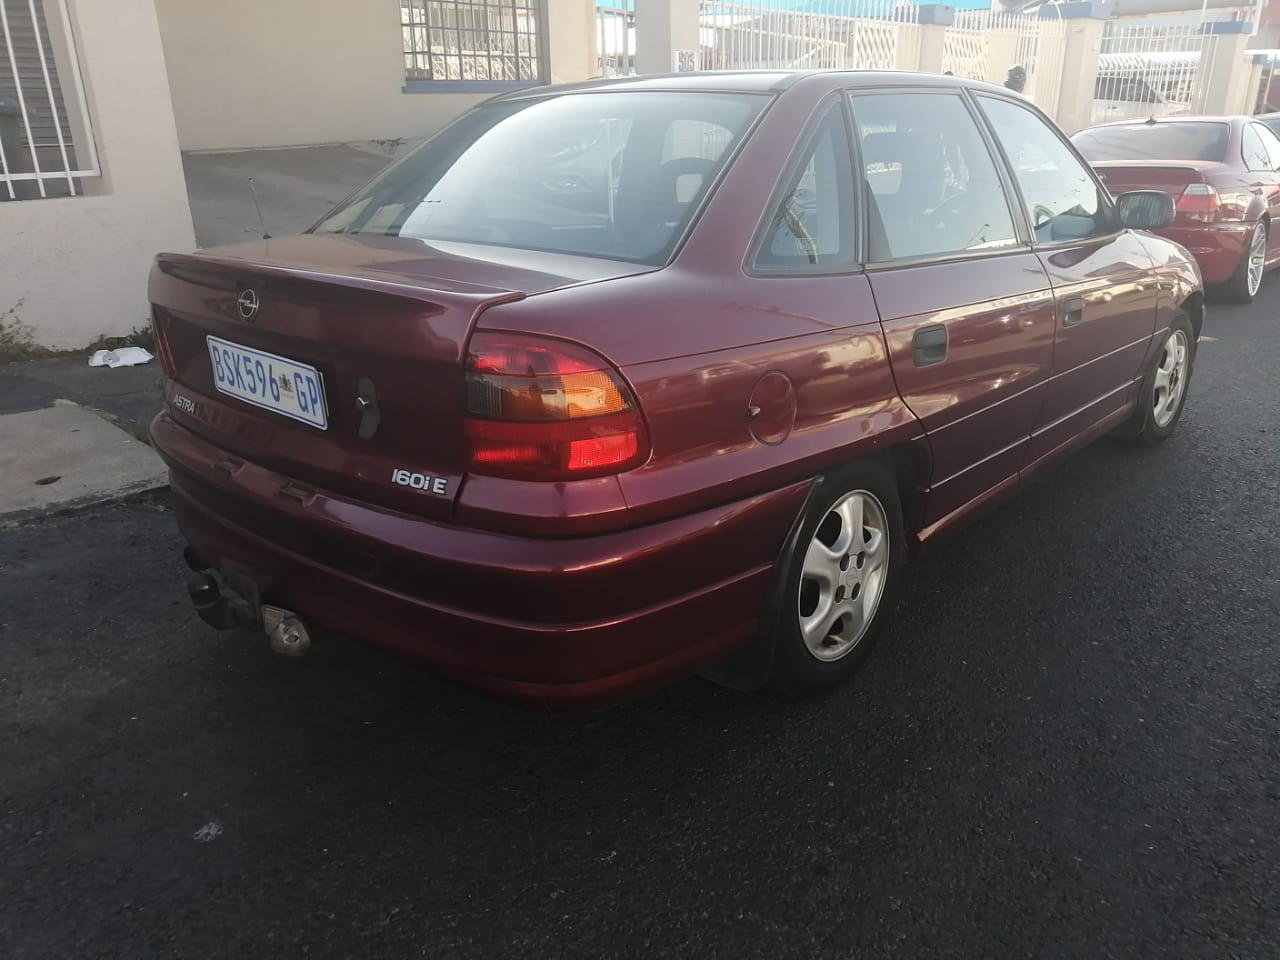 1996 Opel Astra sedan 1.6 Essentia